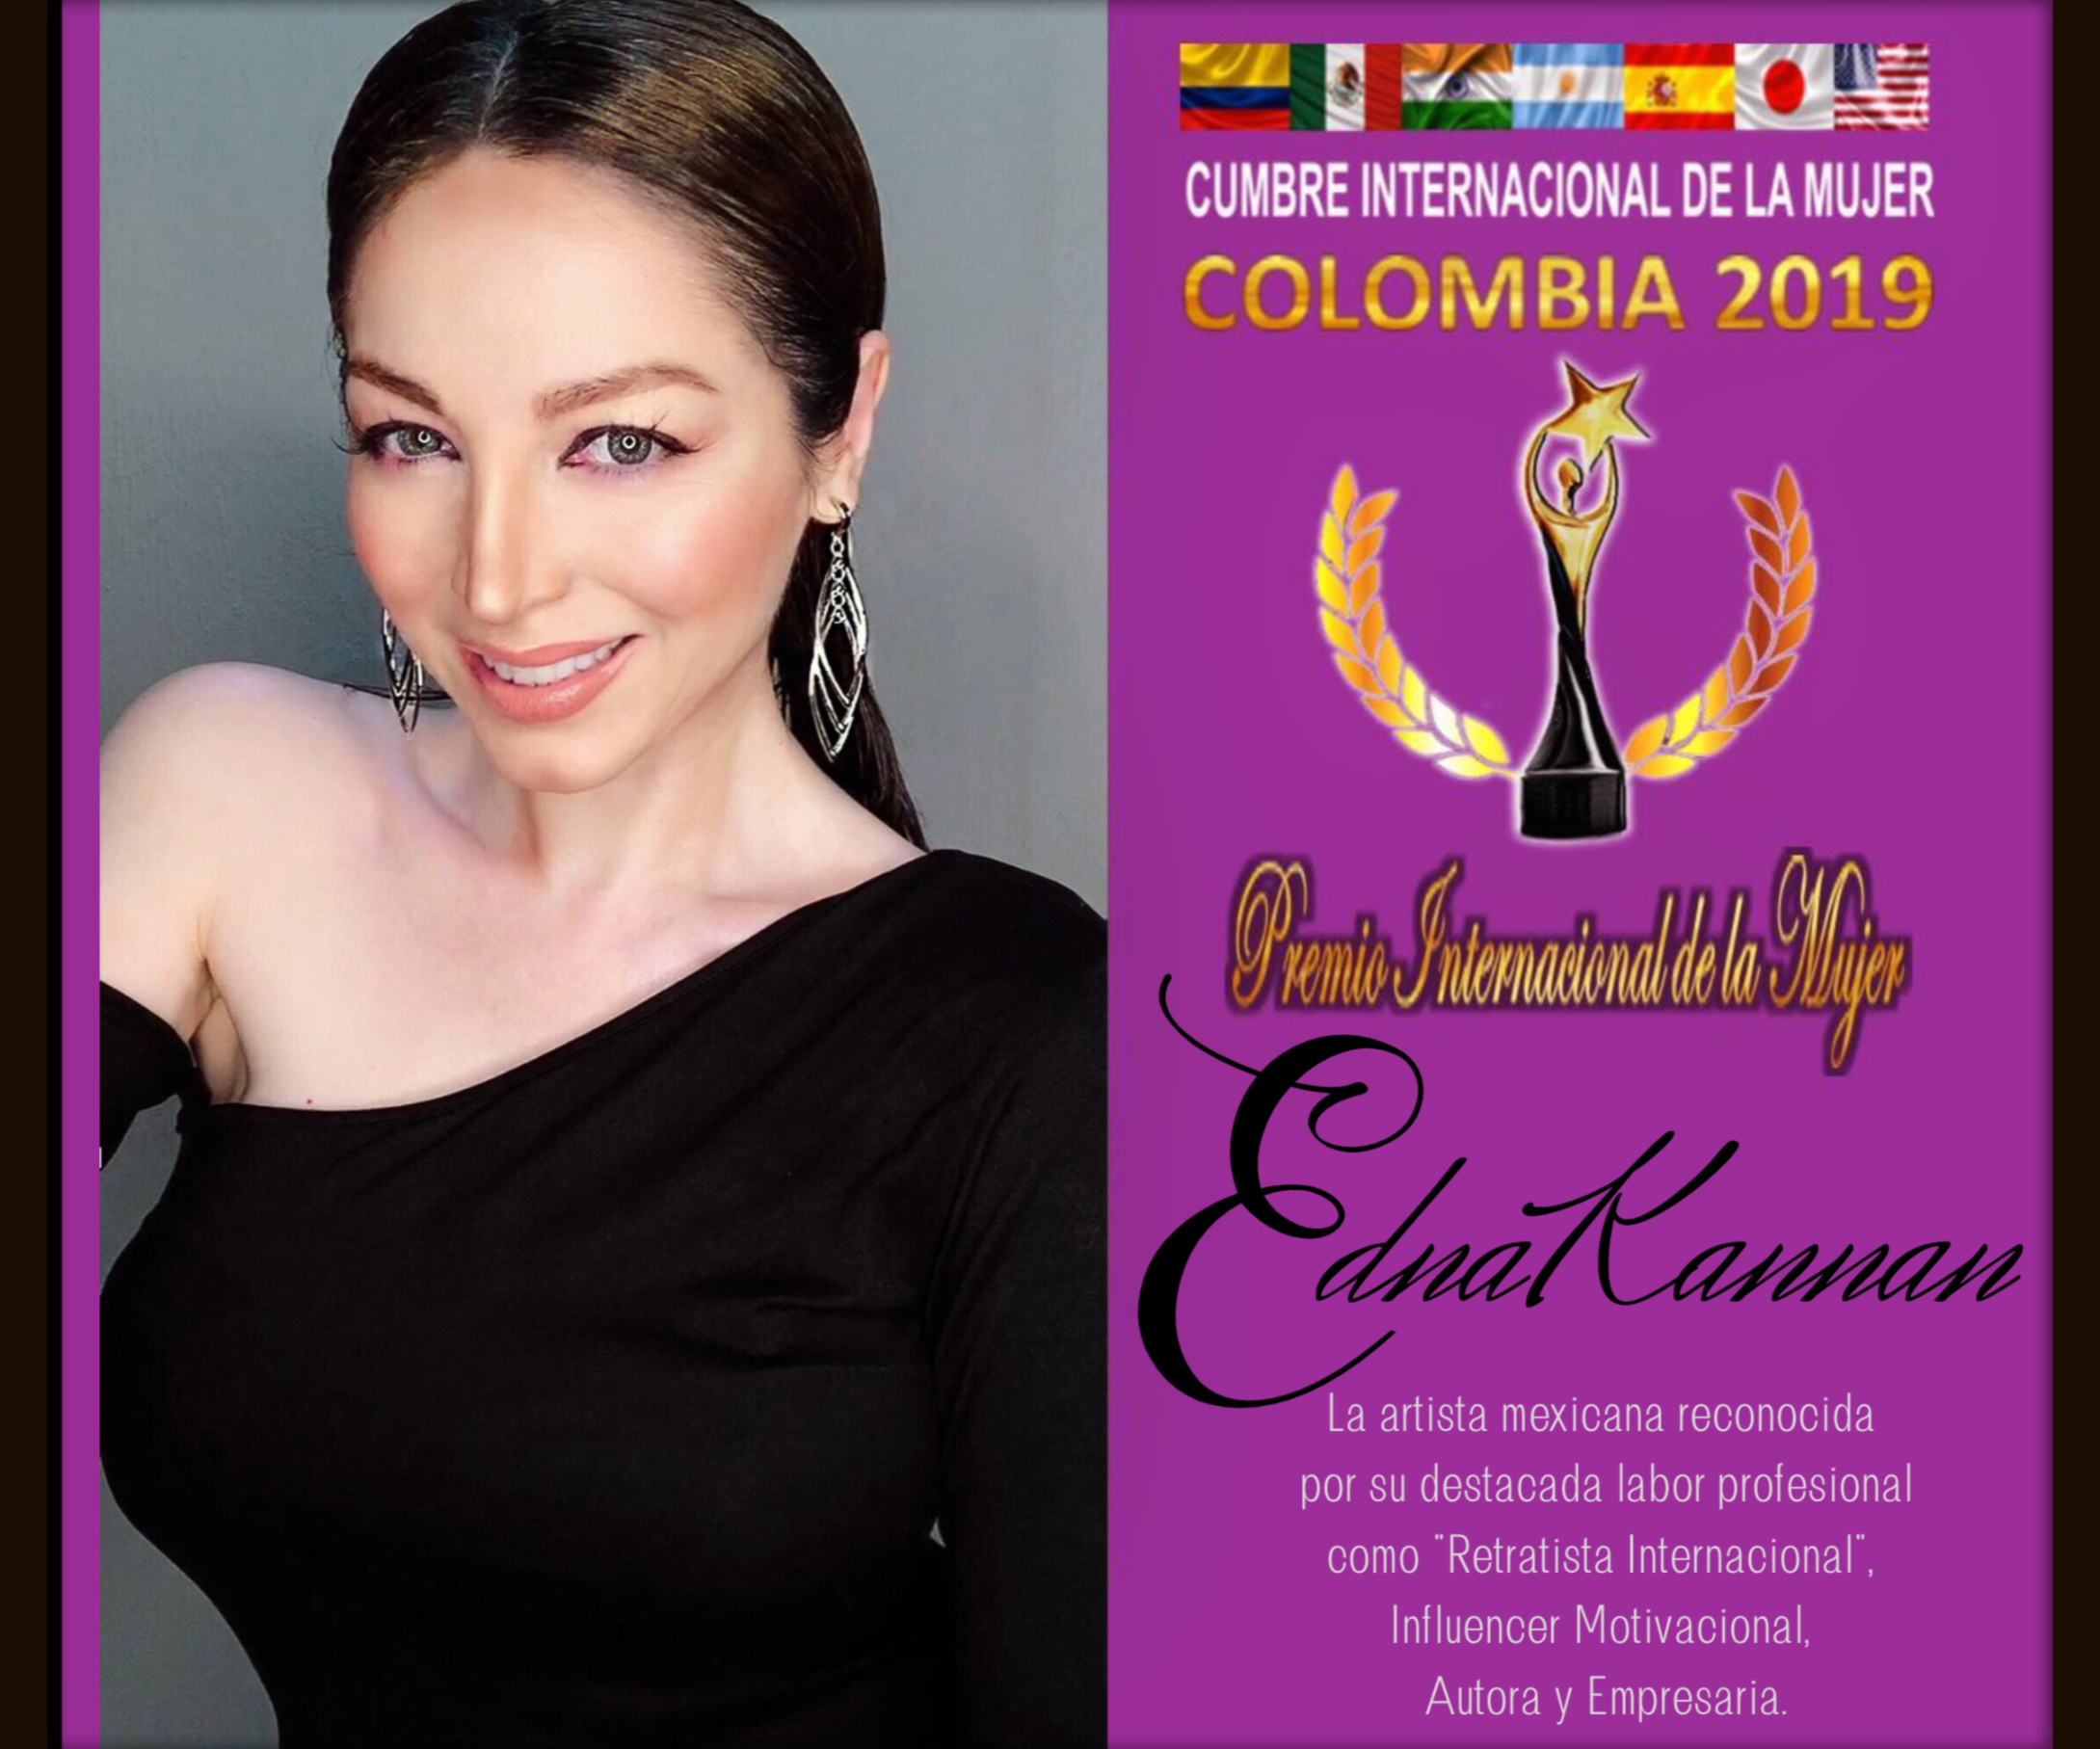 Premio Internacional de la Mujer